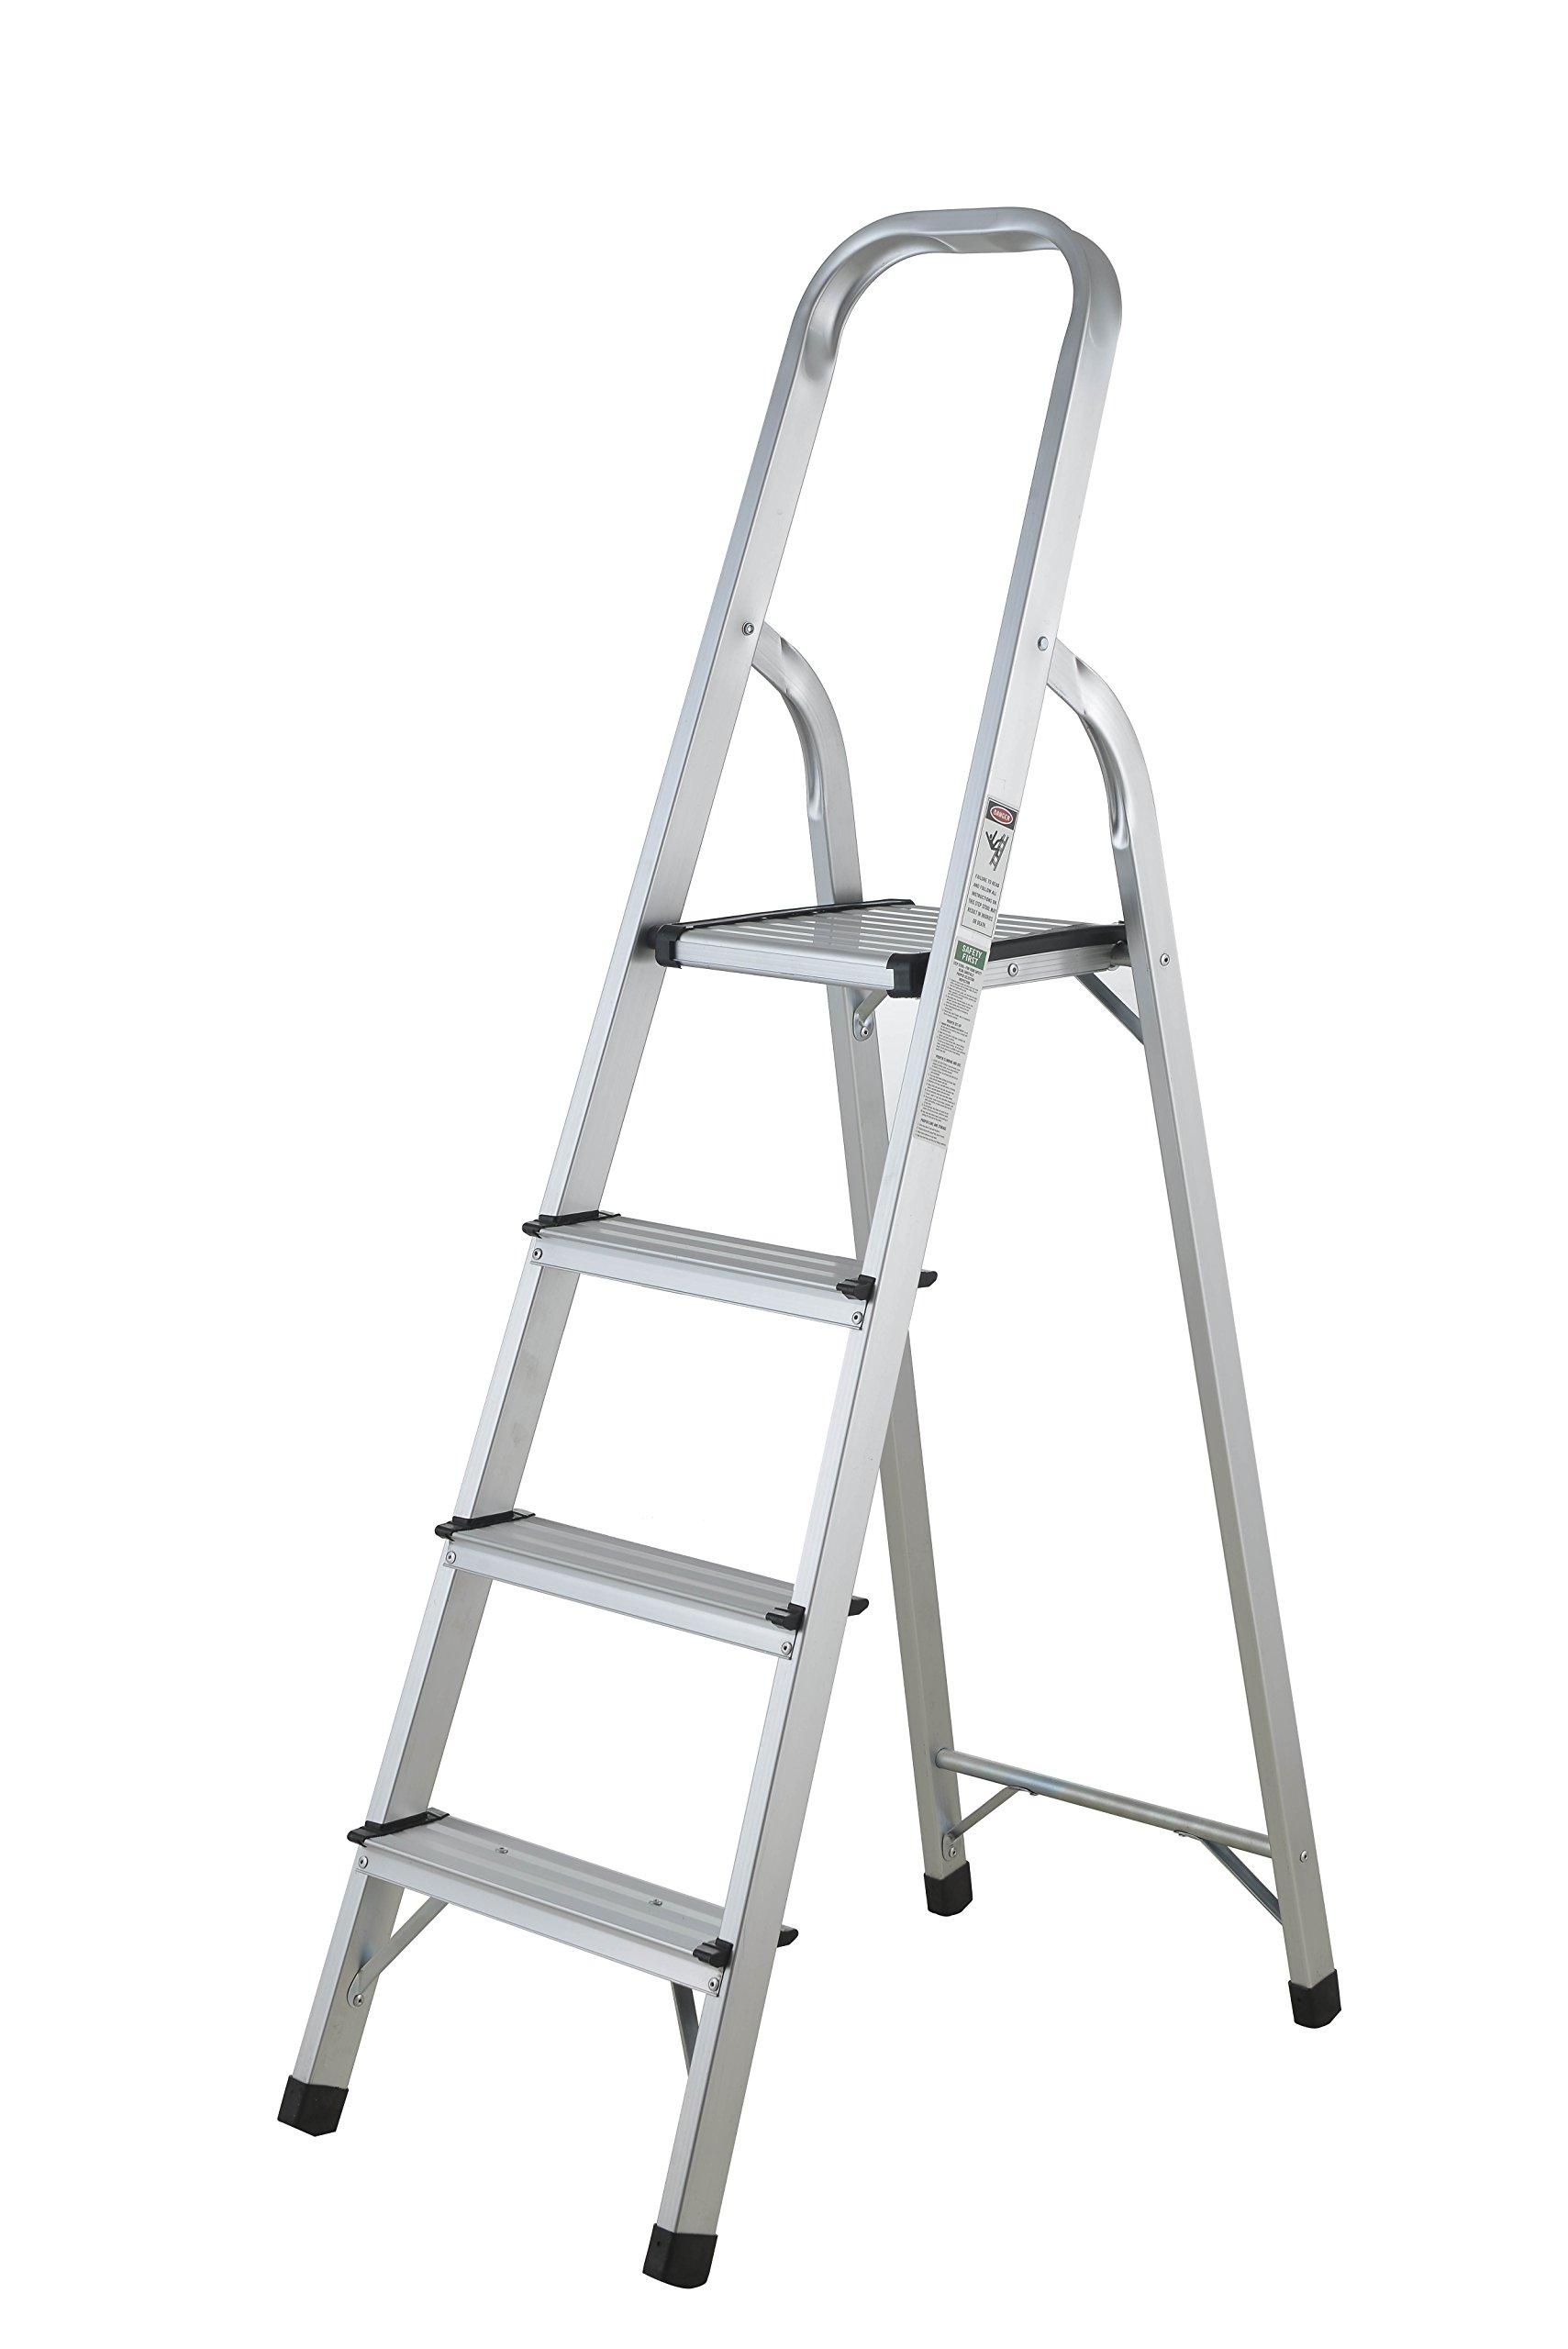 DOMUS 9004 Step Ladder, Silver, Black